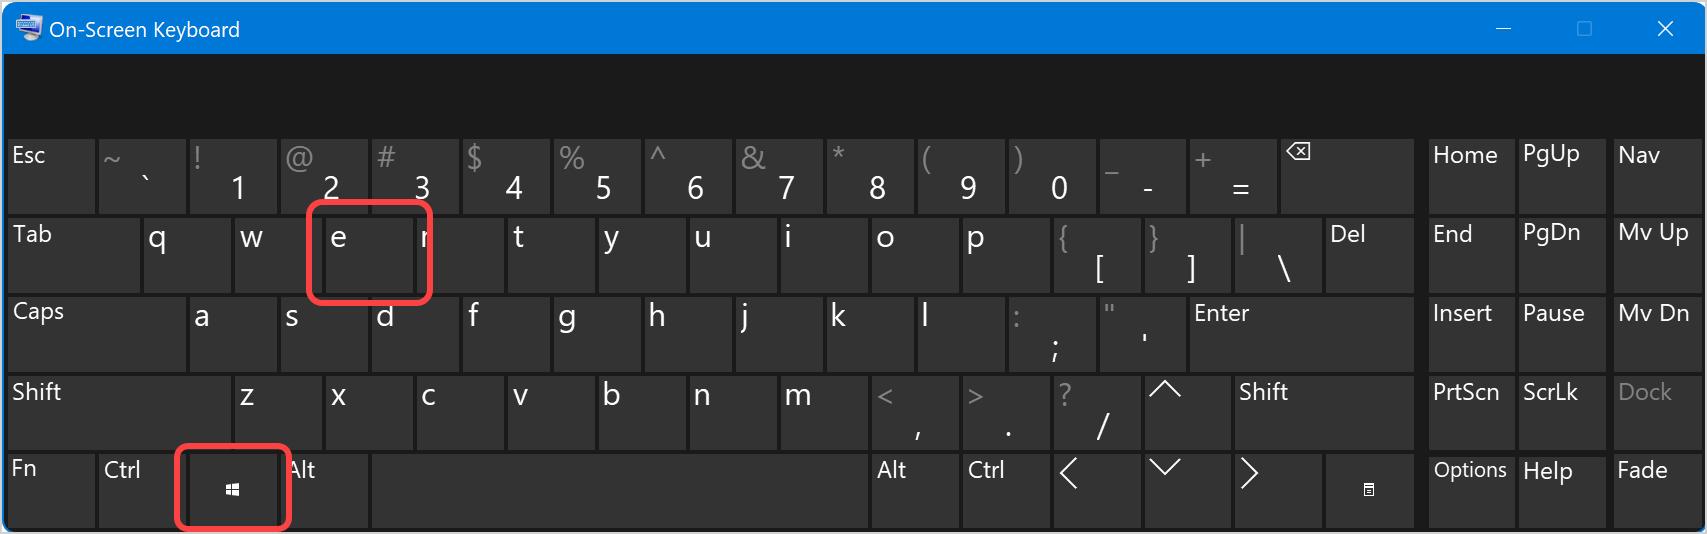 Keyboard Shortcut to Open File Explorer